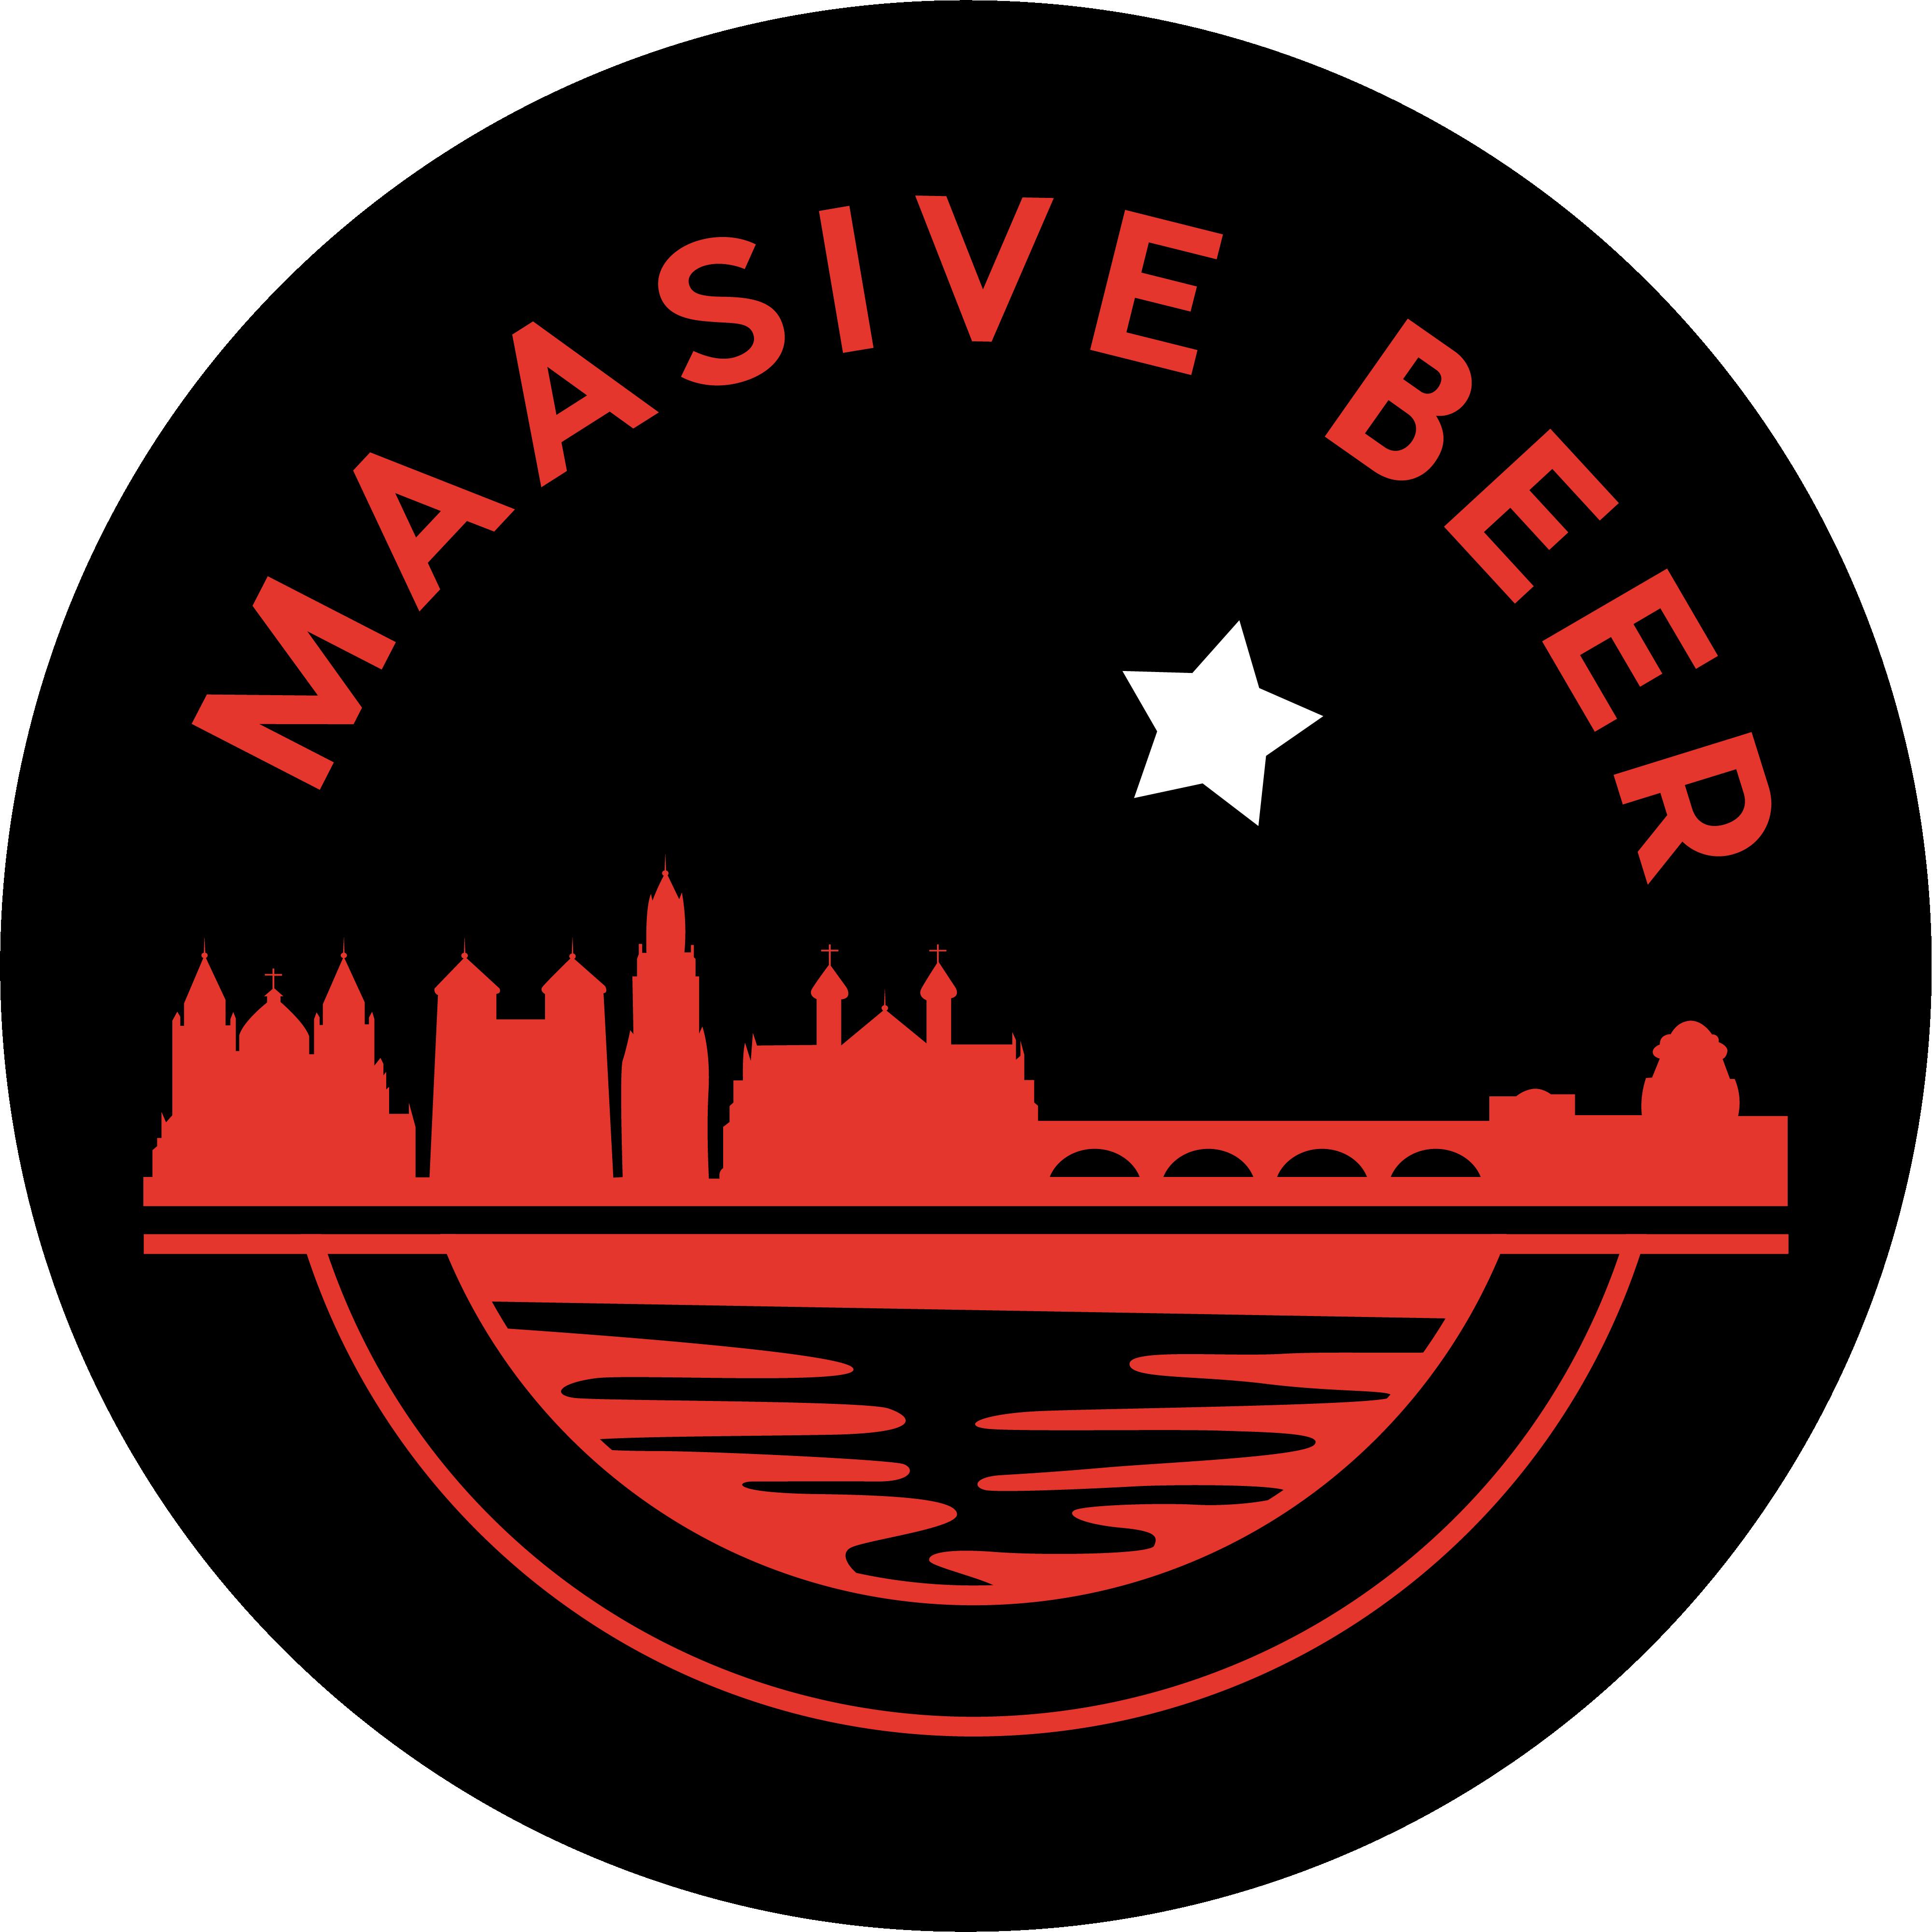 Maasive Beer